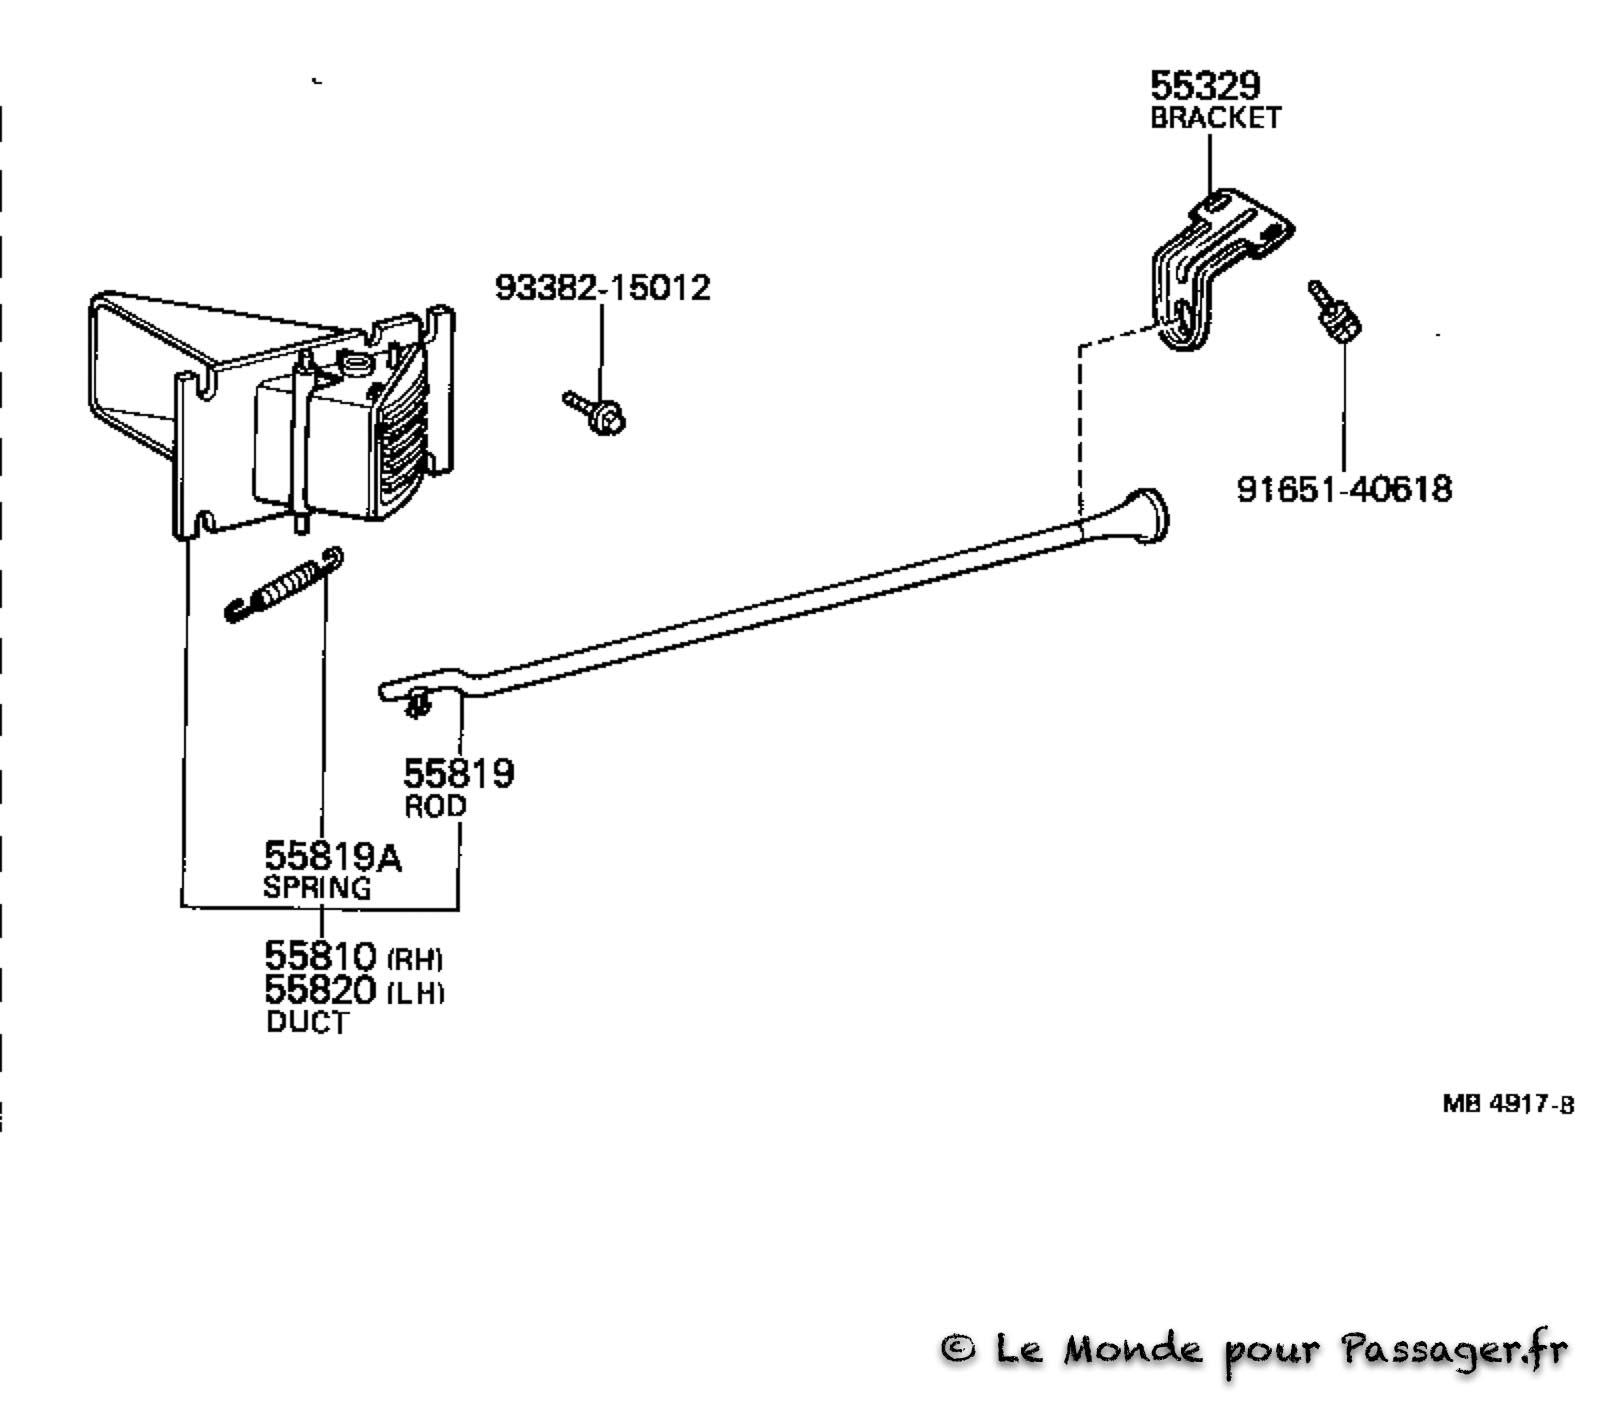 Fj55-Eclatés-Techniques009